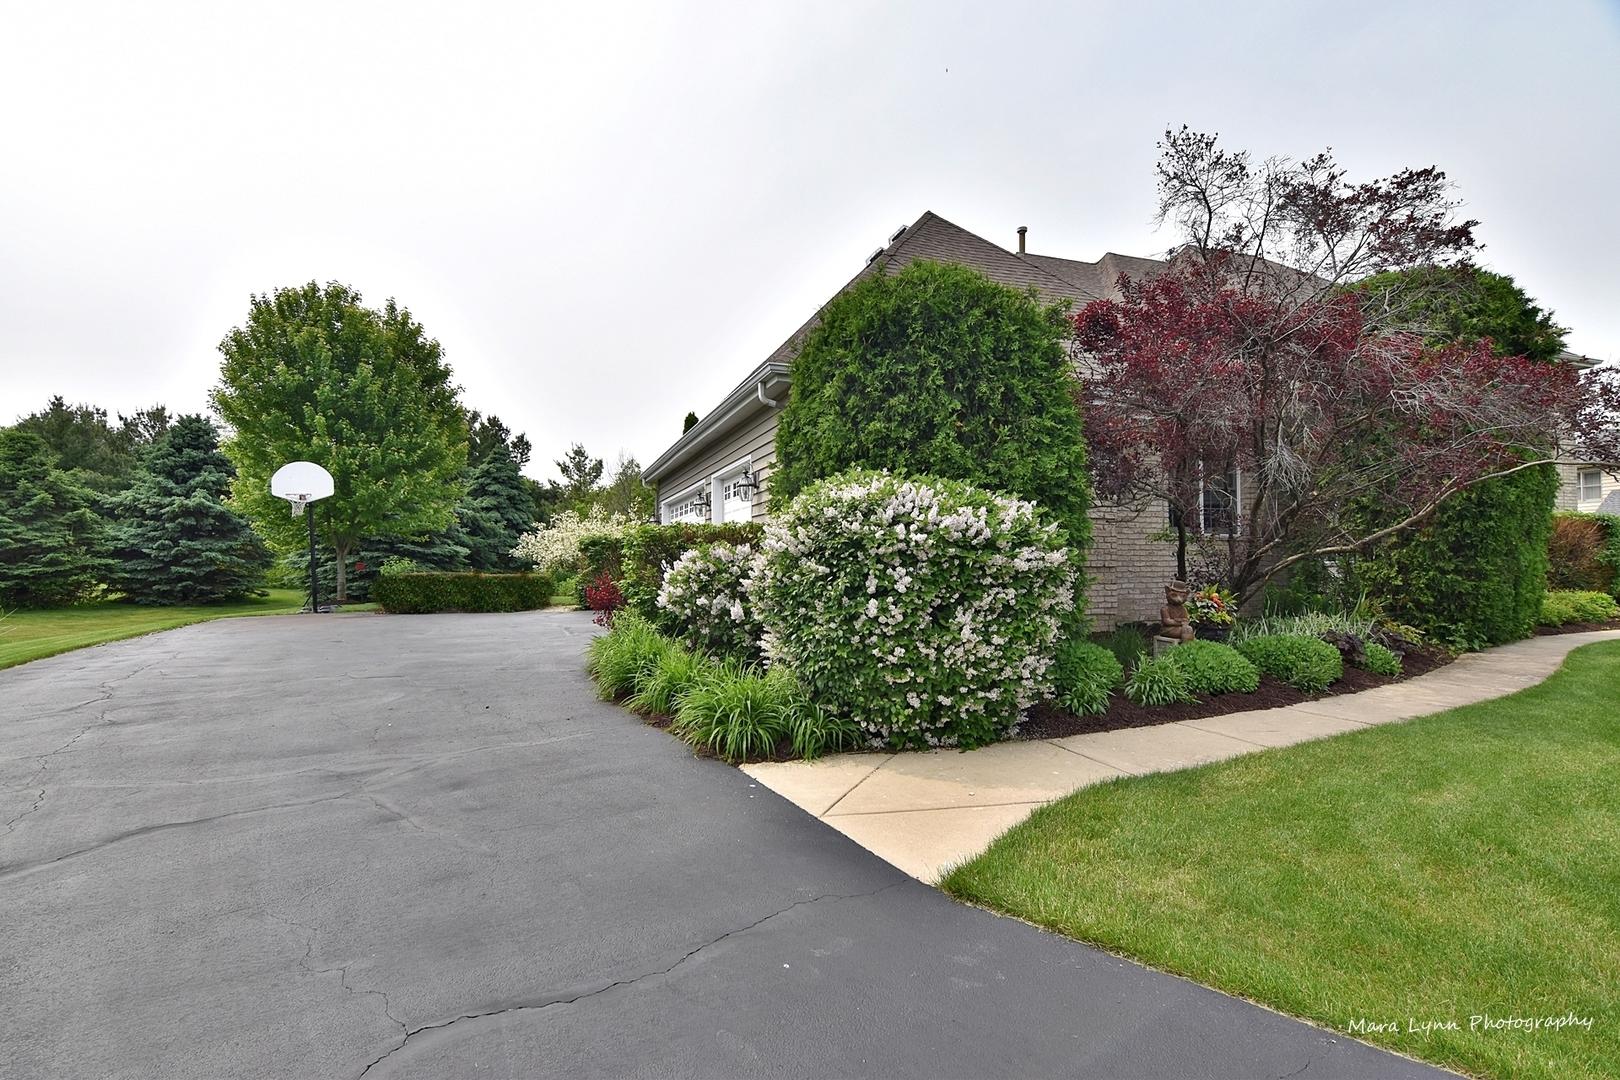 39W356 Cambridge, ST. CHARLES, Illinois, 60175